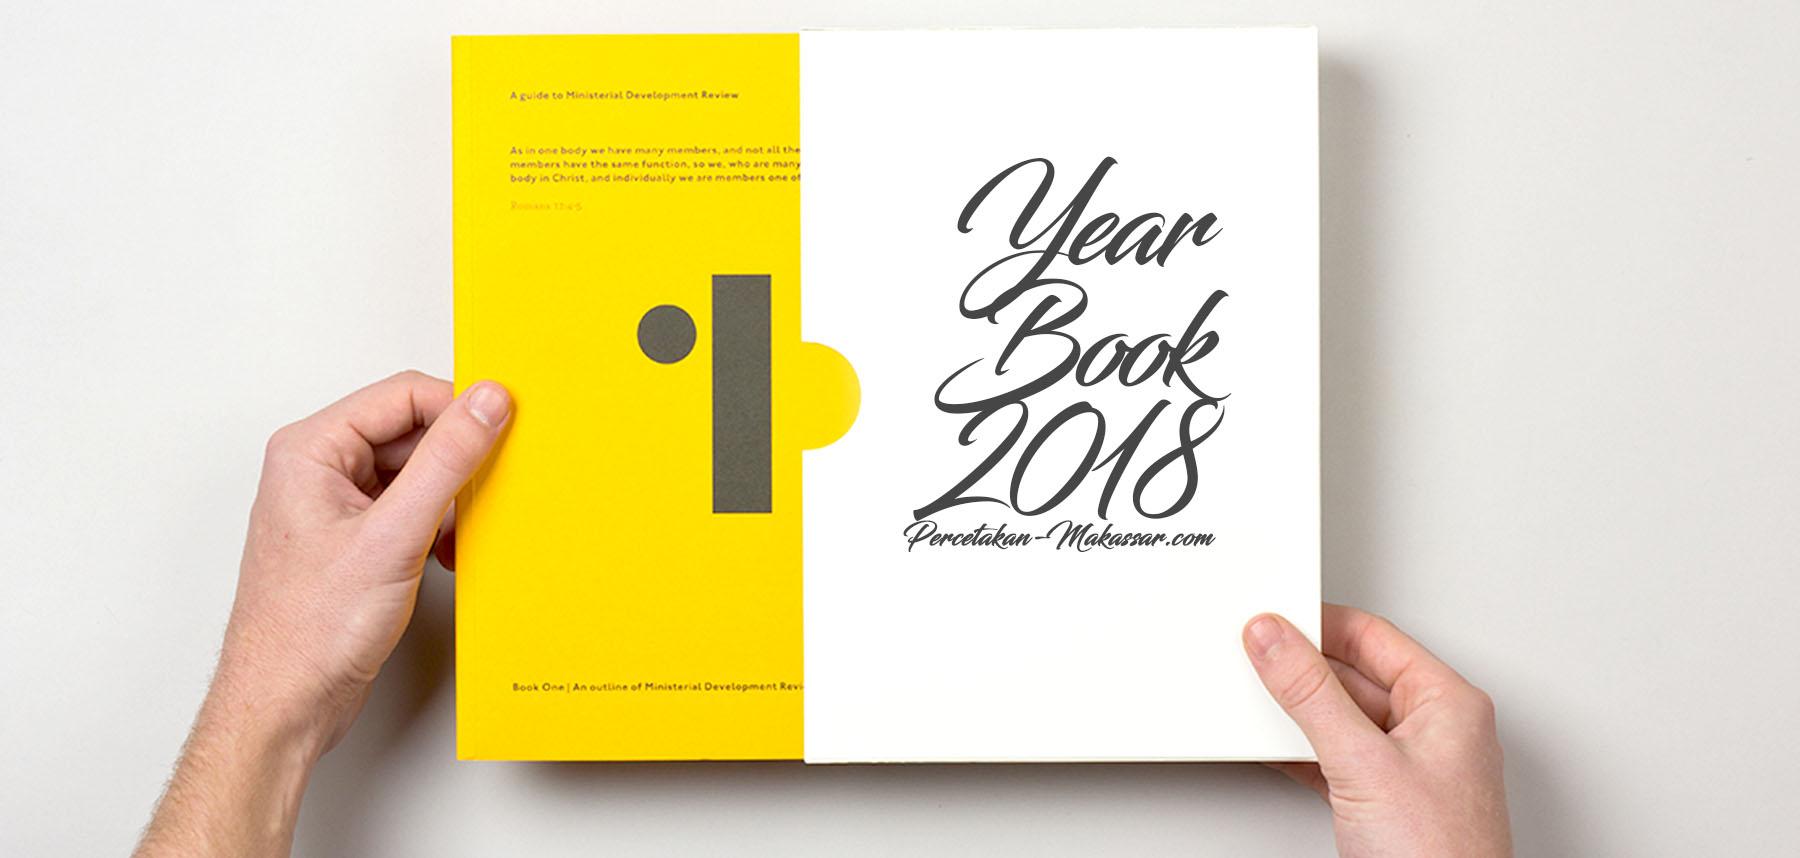 Konsep Buku Tahunan yang Akan Dikenang Sepanjang Masa